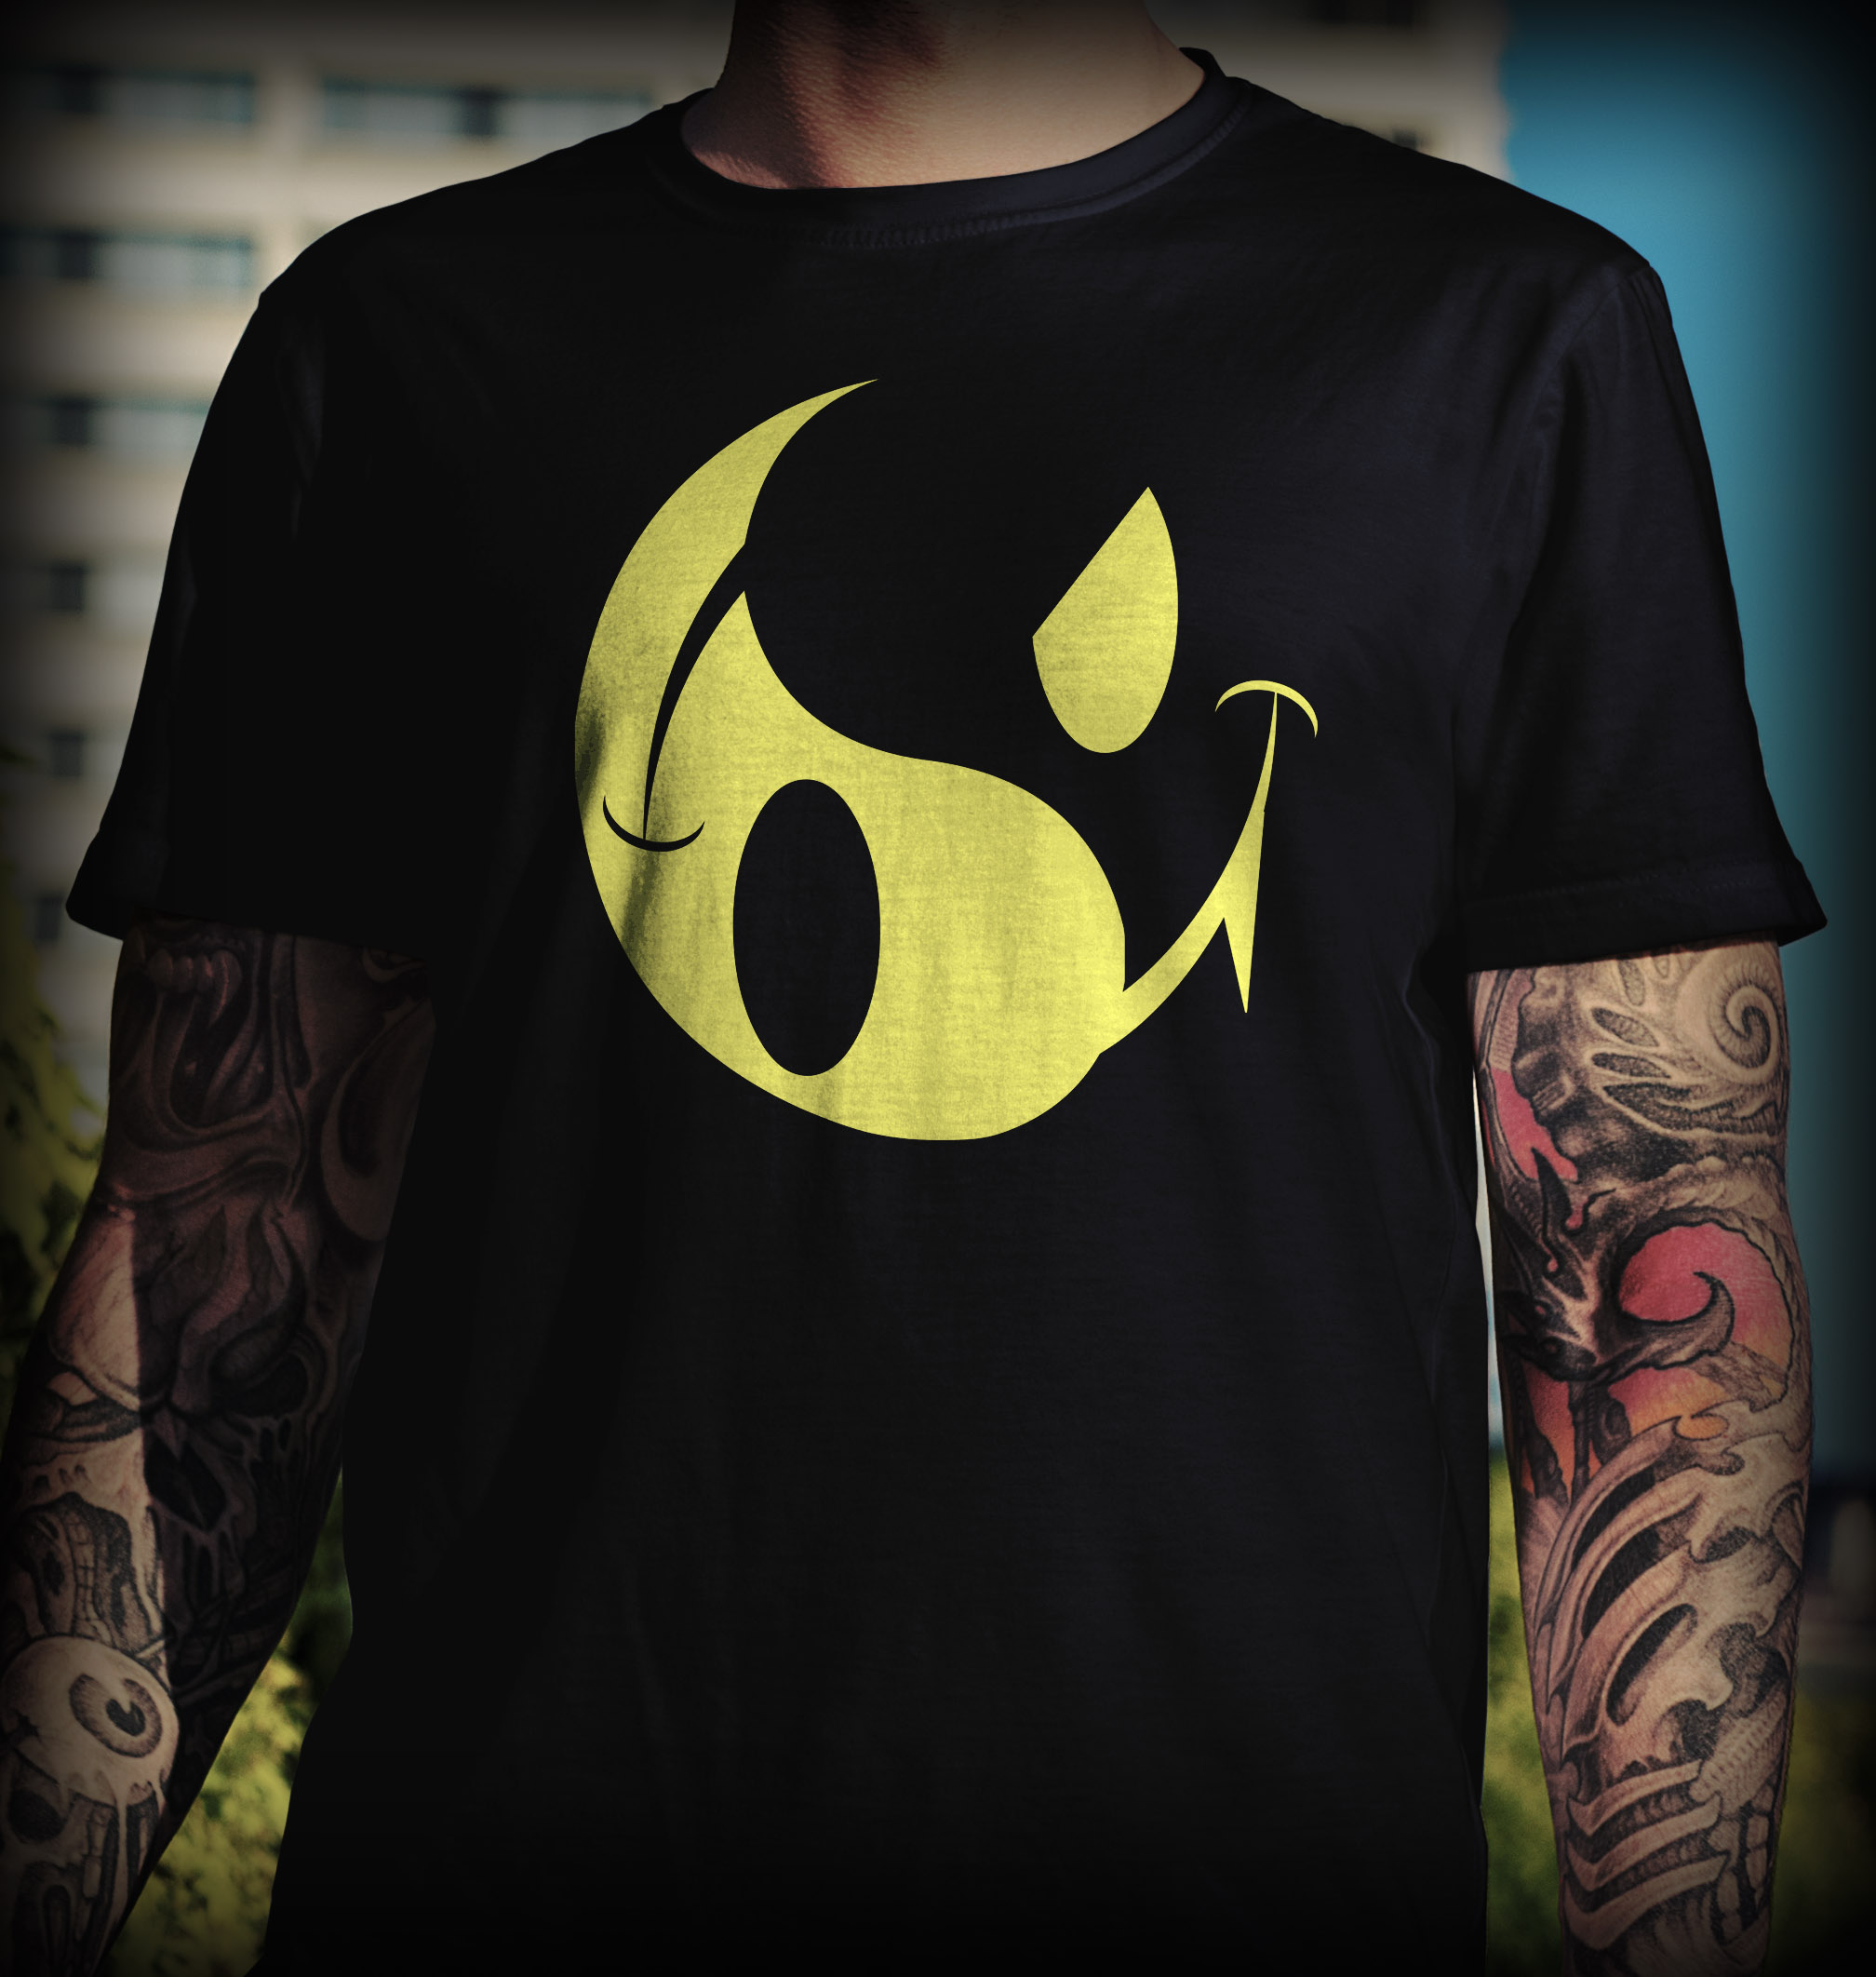 Design t shirts hoodies - T Shirt And Hoodies Acid Techno Design Smiley Yin Yang Acidtekno Com